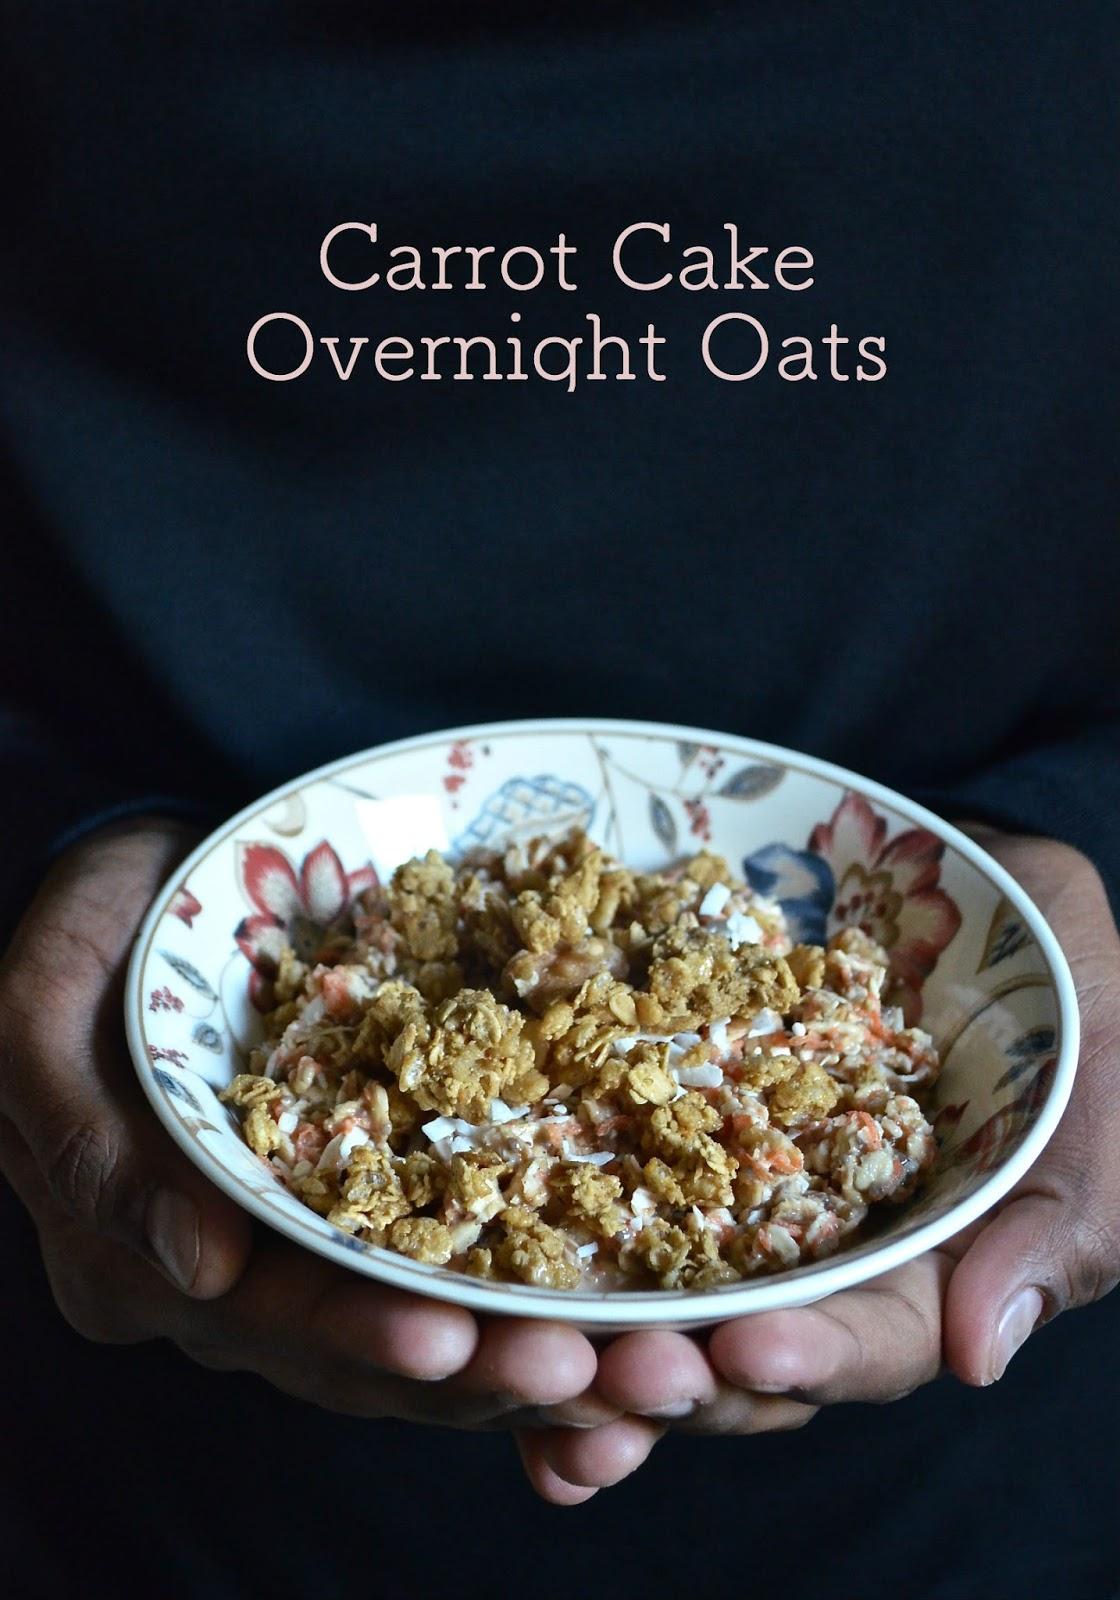 Overnight Soaked Oats Carrot Cake Recipe